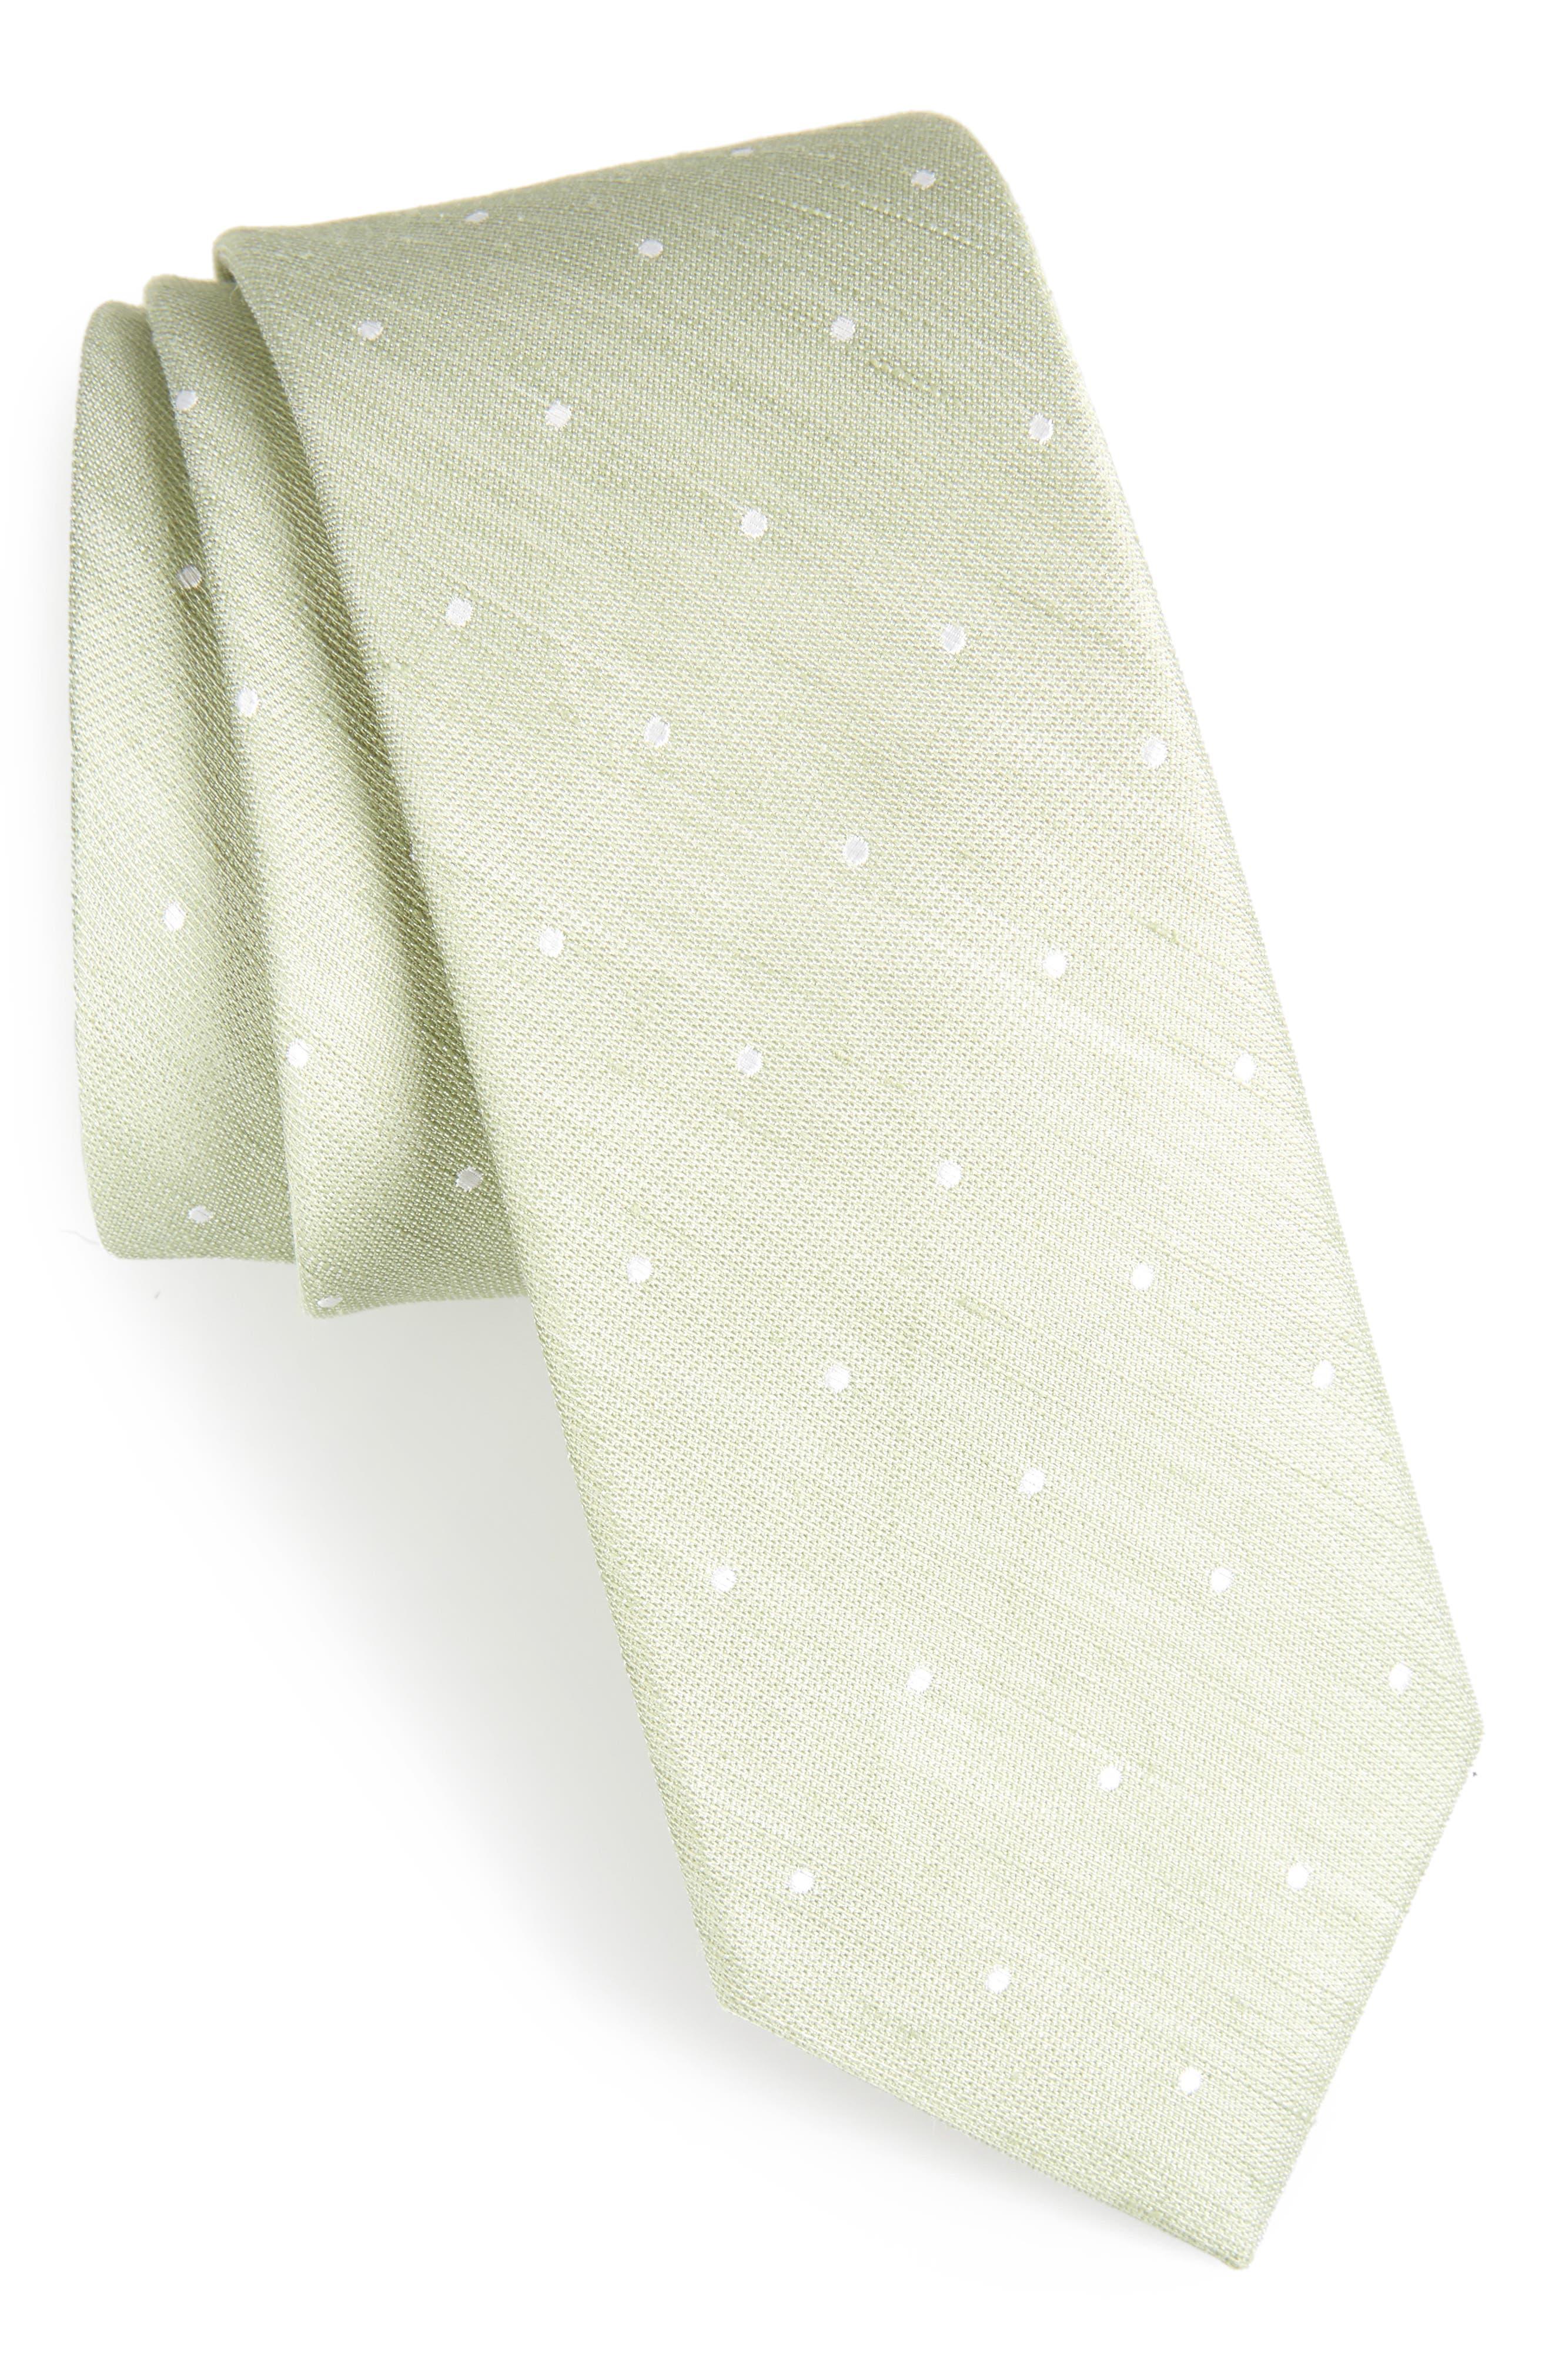 Bulletin Dot Silk & Linen Tie,                         Main,                         color, Sage Green